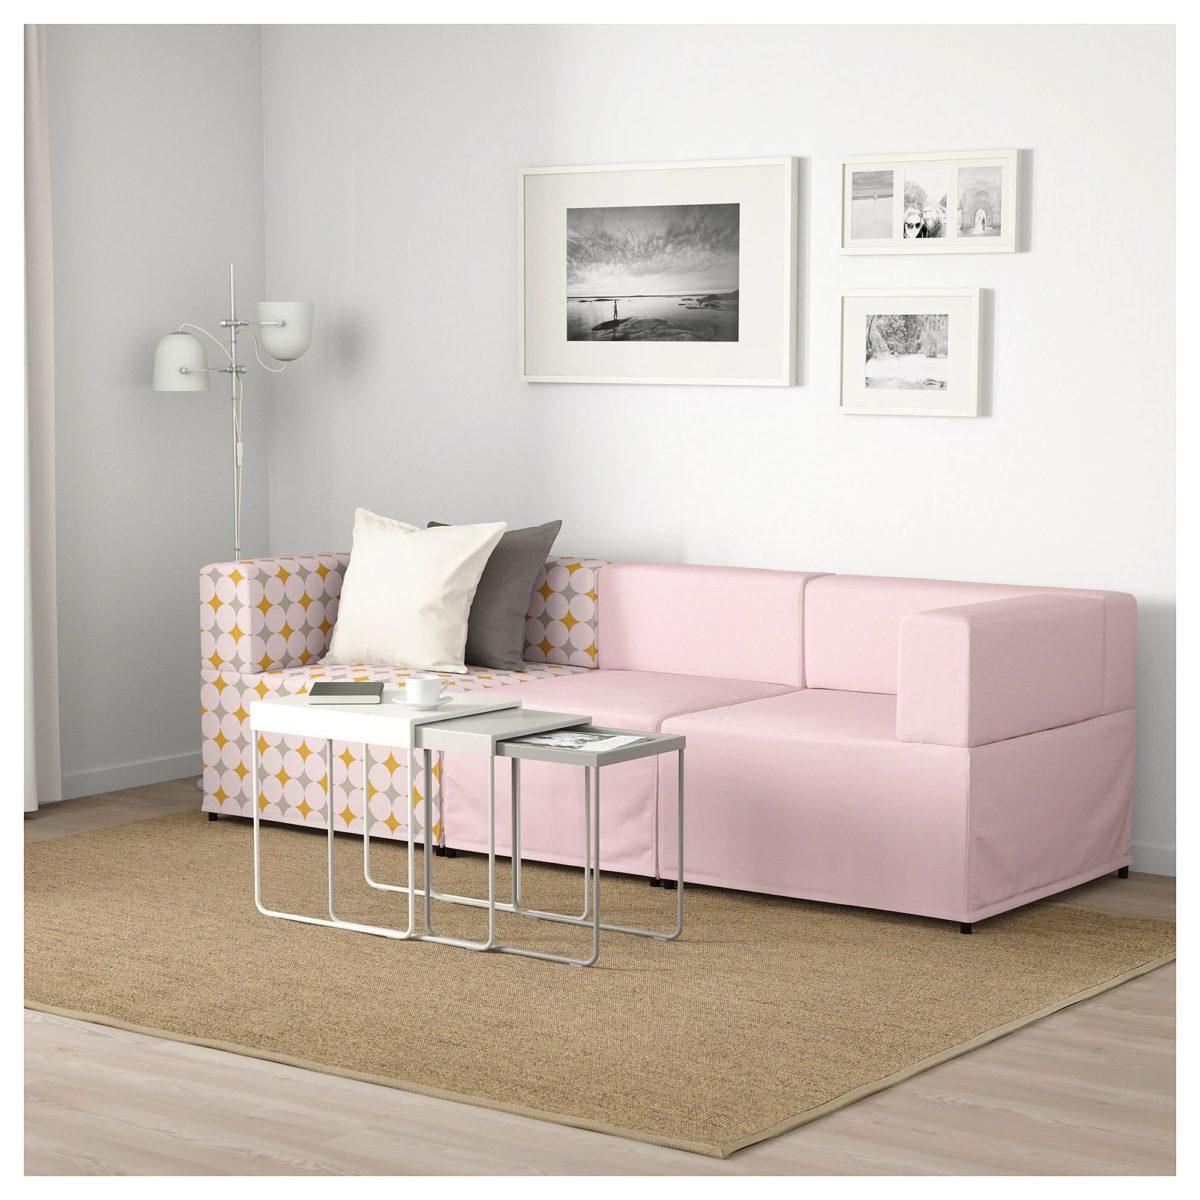 Ikea Divani Componibili.Divani Ikea 2019